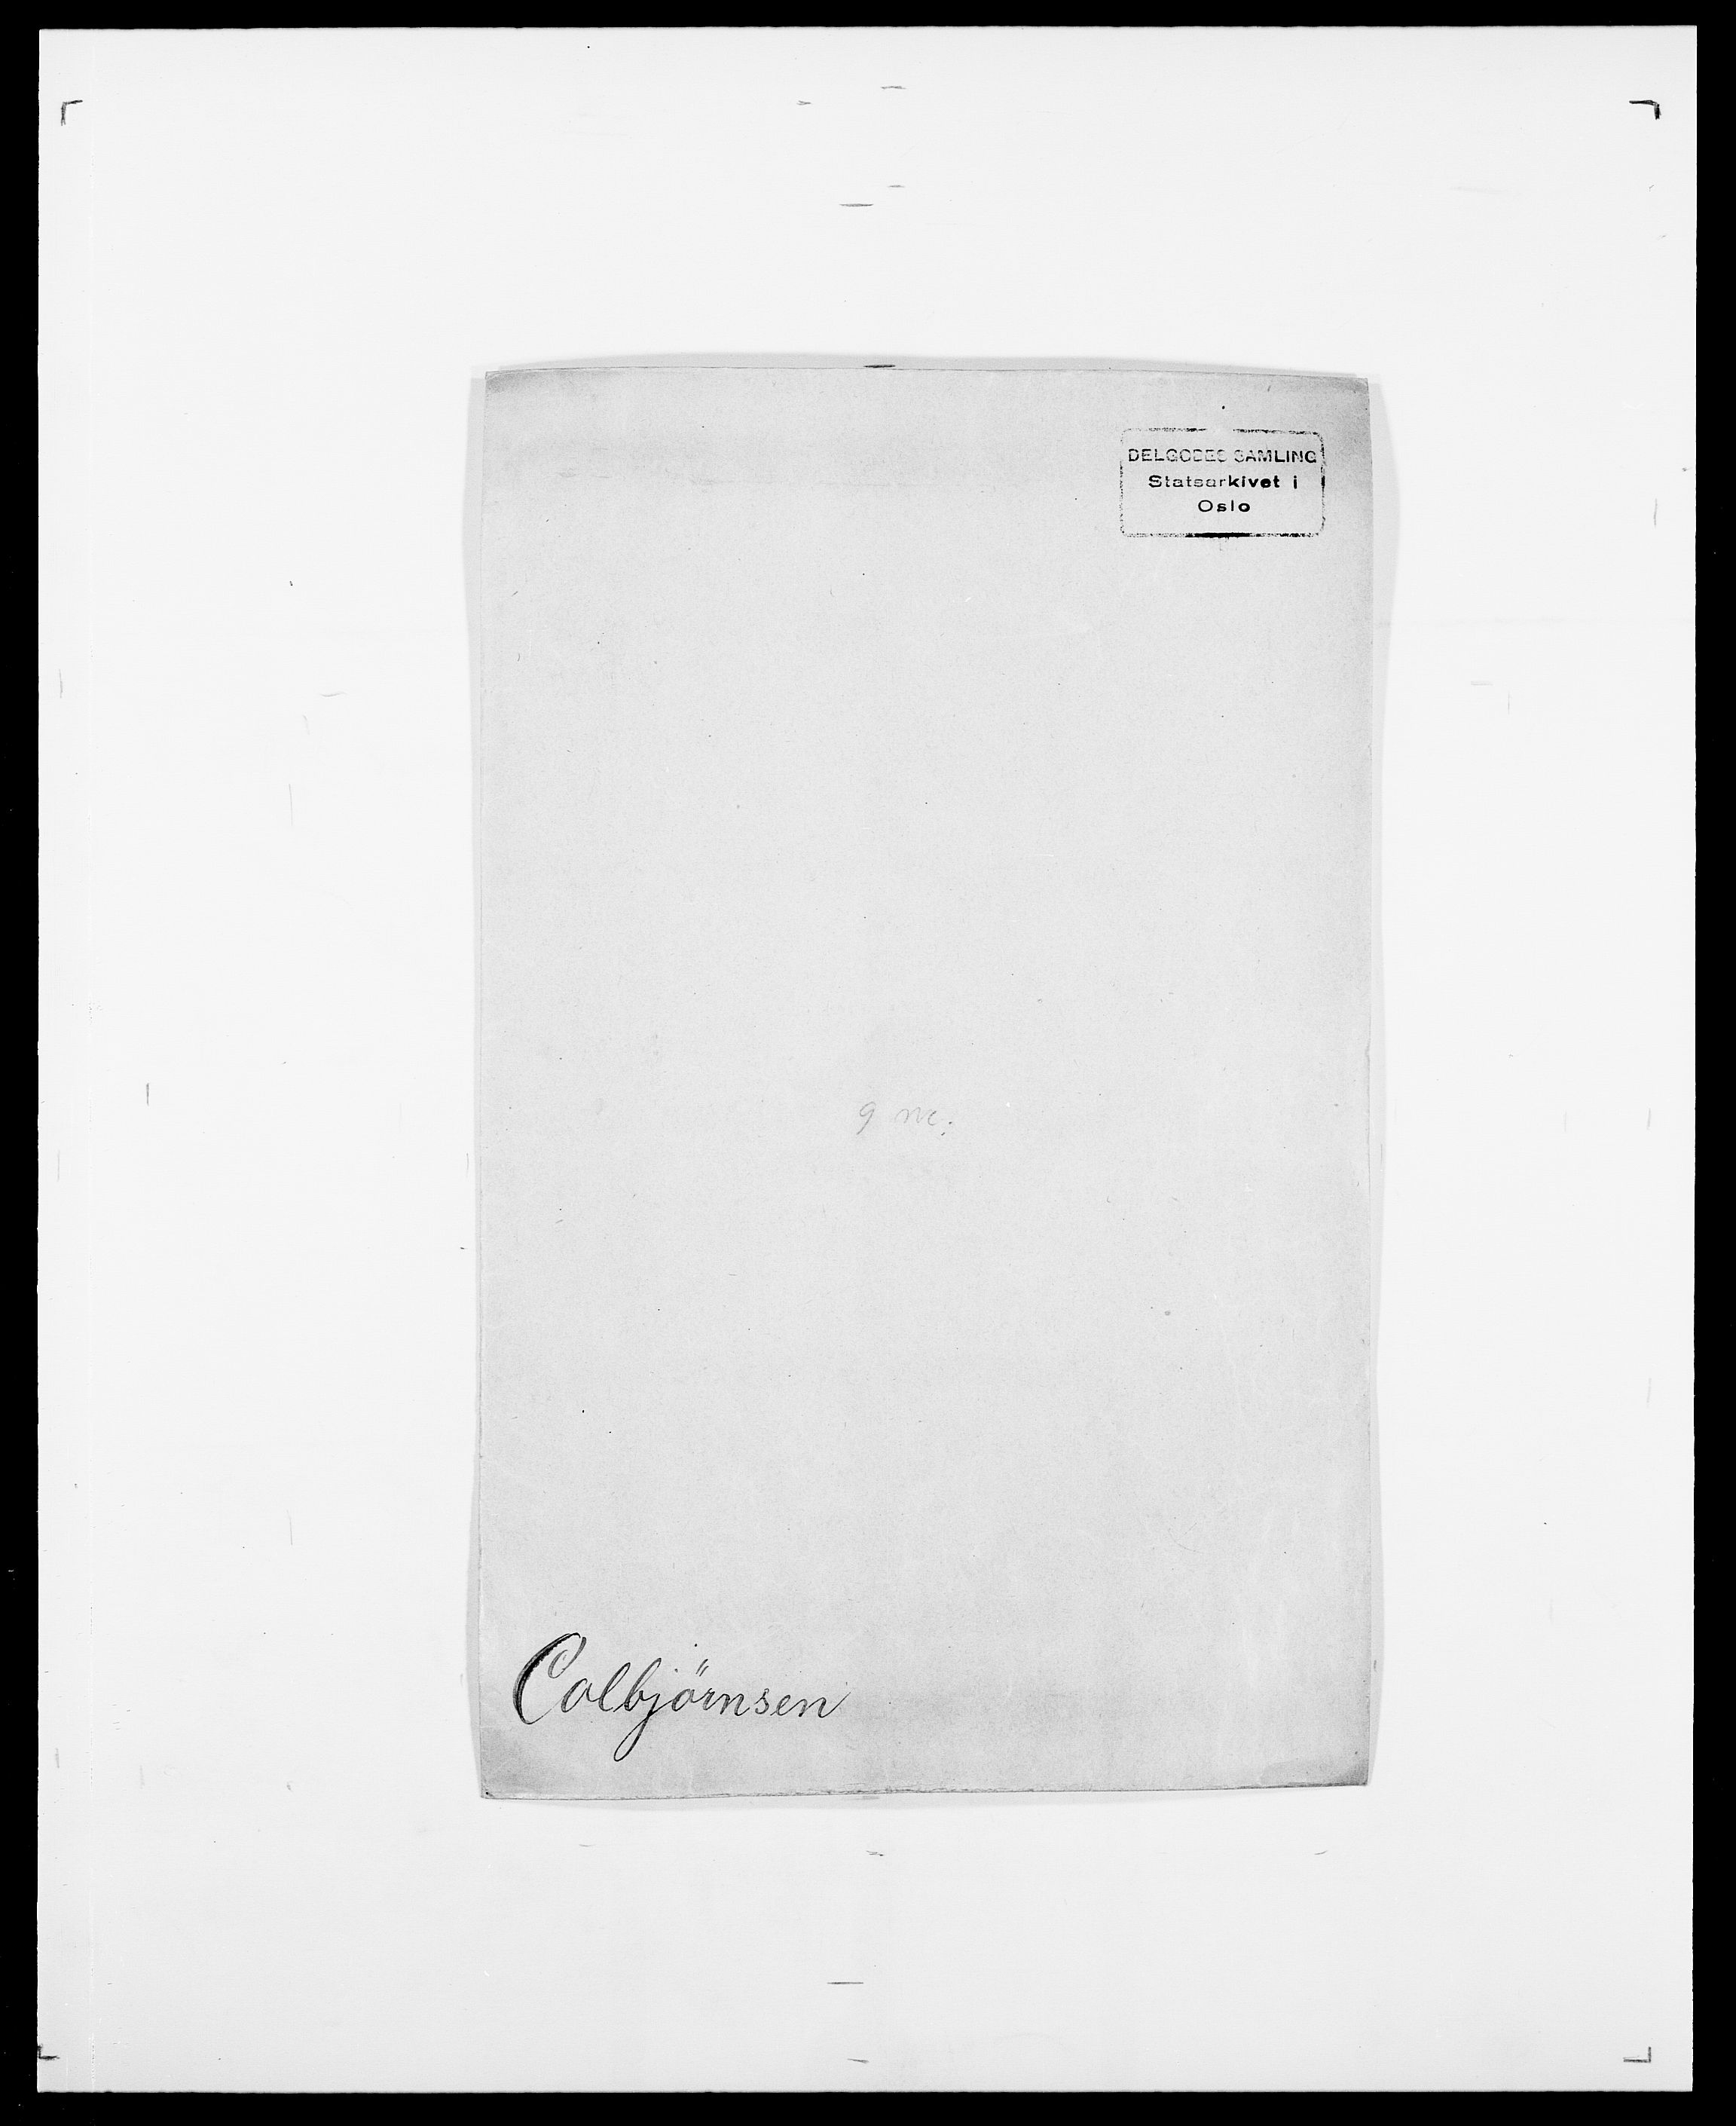 SAO, Delgobe, Charles Antoine - samling, D/Da/L0008: Capjon - Dagenbolt, s. 409